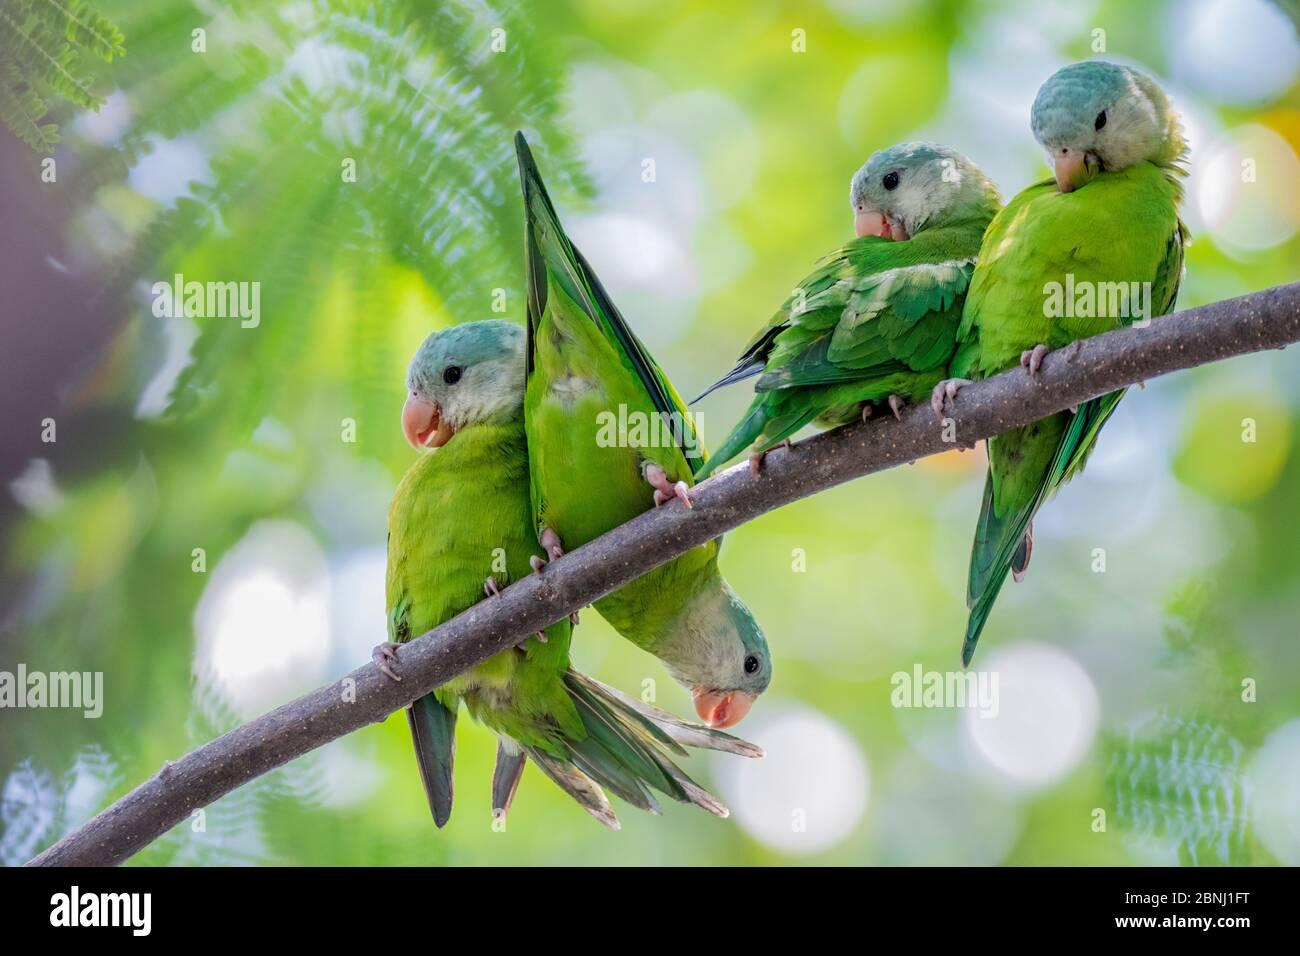 Grey-cheeked parakeets (Brotogeris pyrrhoptera) perched and grooming on a branch. Guayaquil, Guayas, Ecuador. Stock Photo